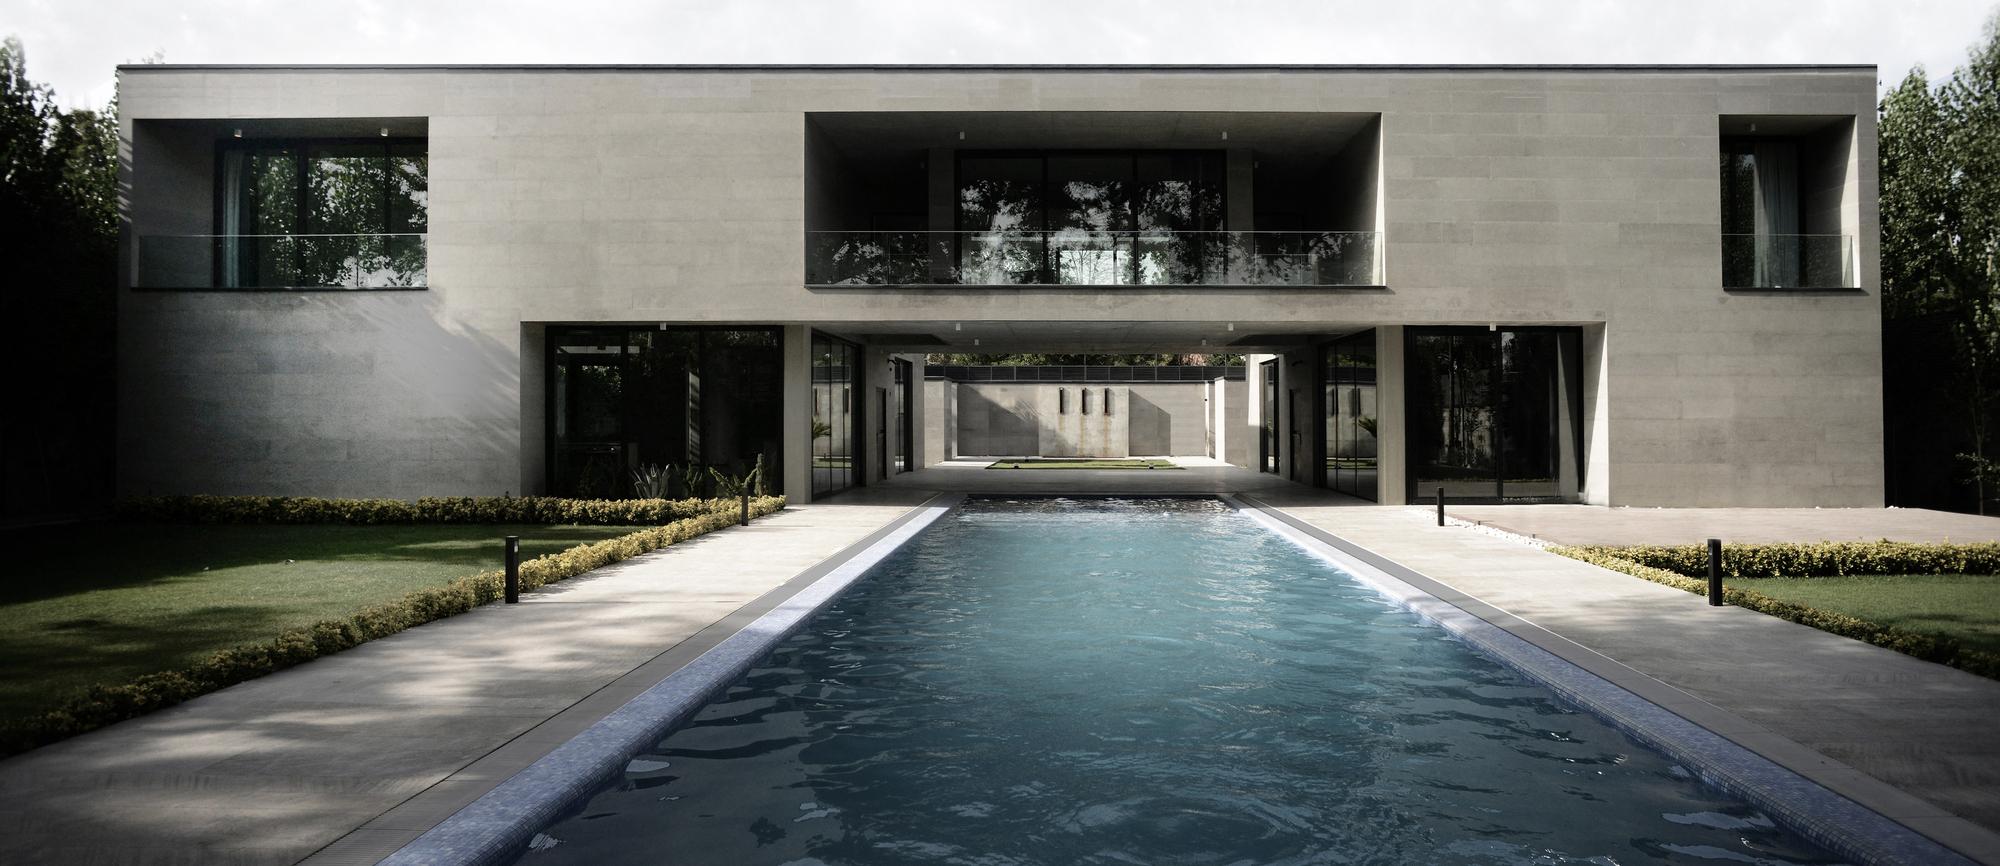 Villa-Safadasht / Kamran Heirati Architects